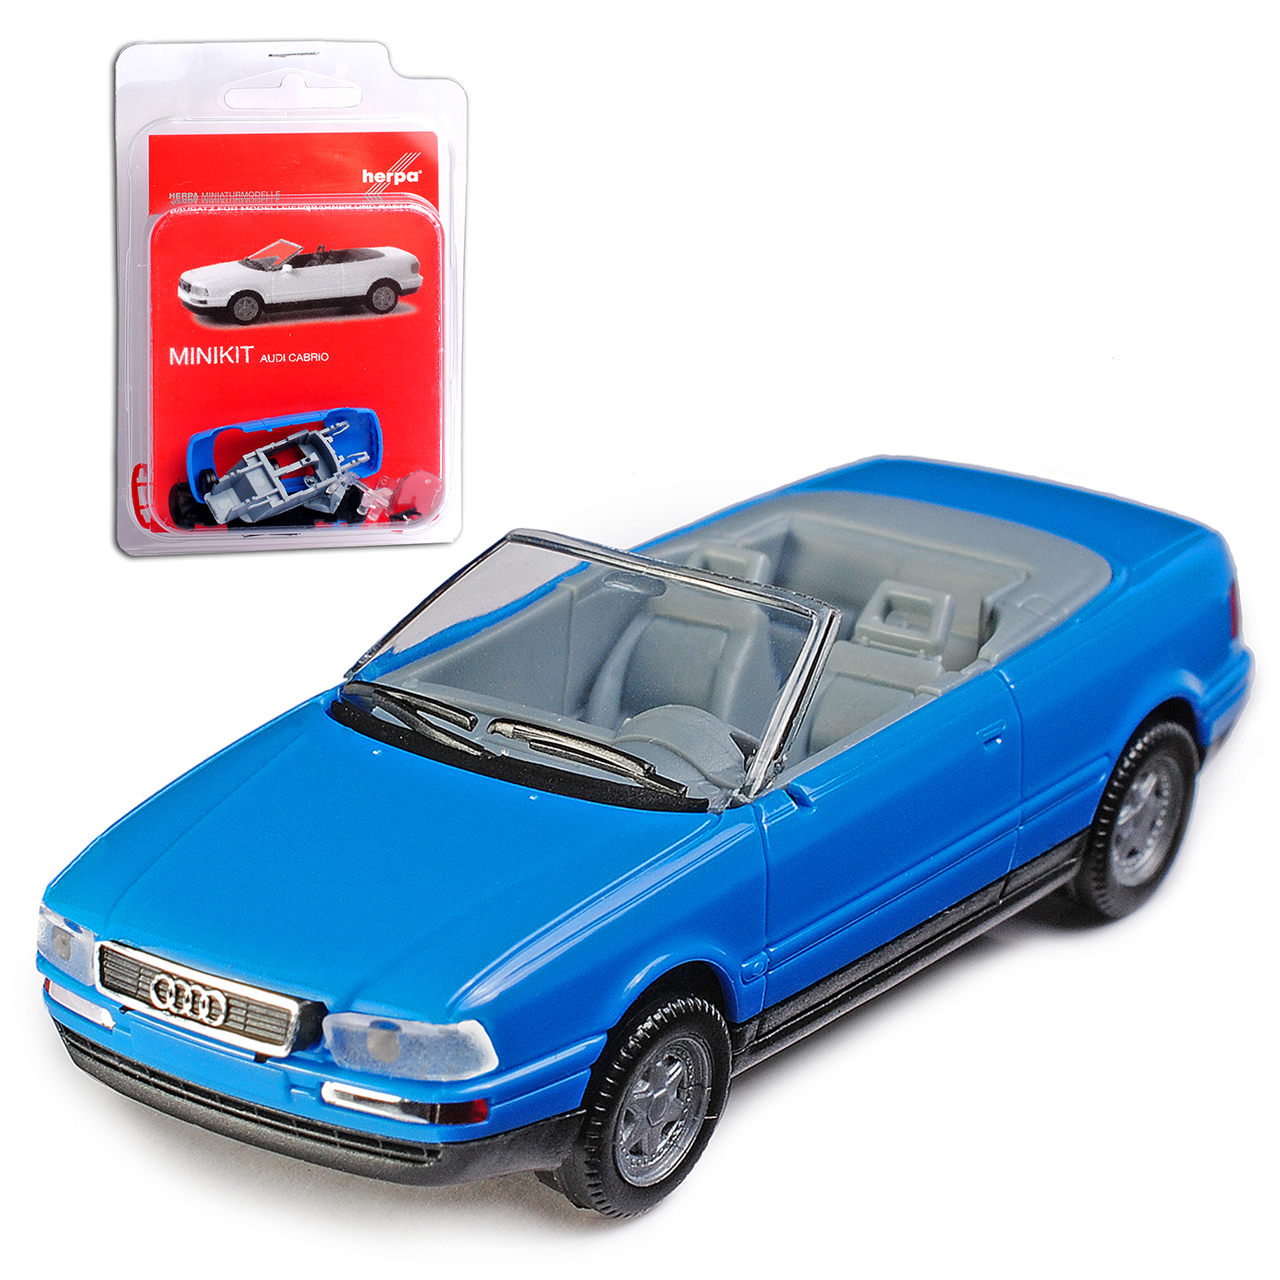 Audi 80 B4 8C convertible azul abierto 1991-1995 Kit Kit H0 1:87 Herpa modelo aircondition.